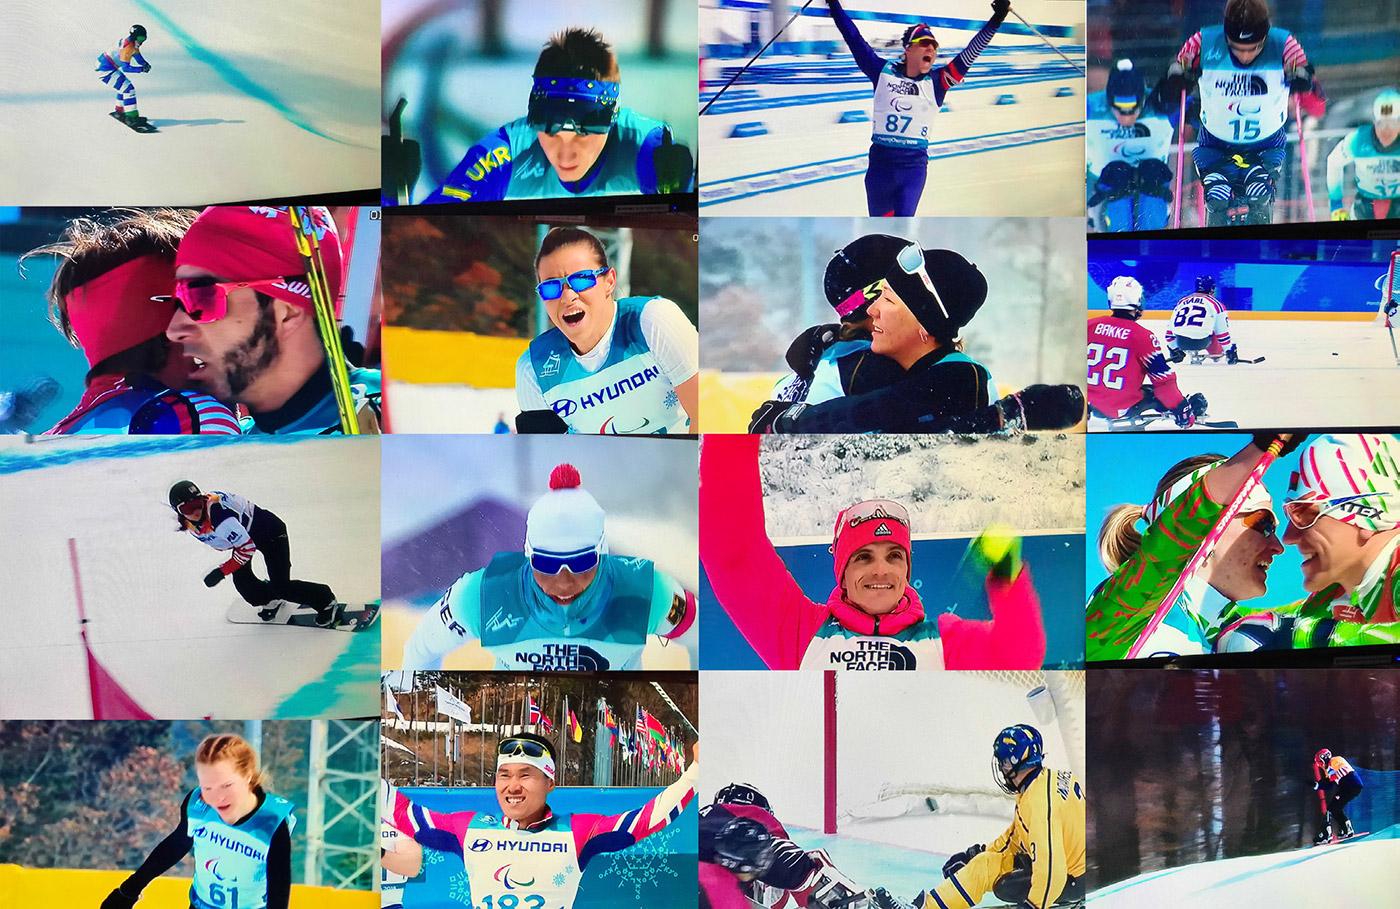 PyeongChang Paralympics 2018 Photo Montage 7 - Paralympic Athletes